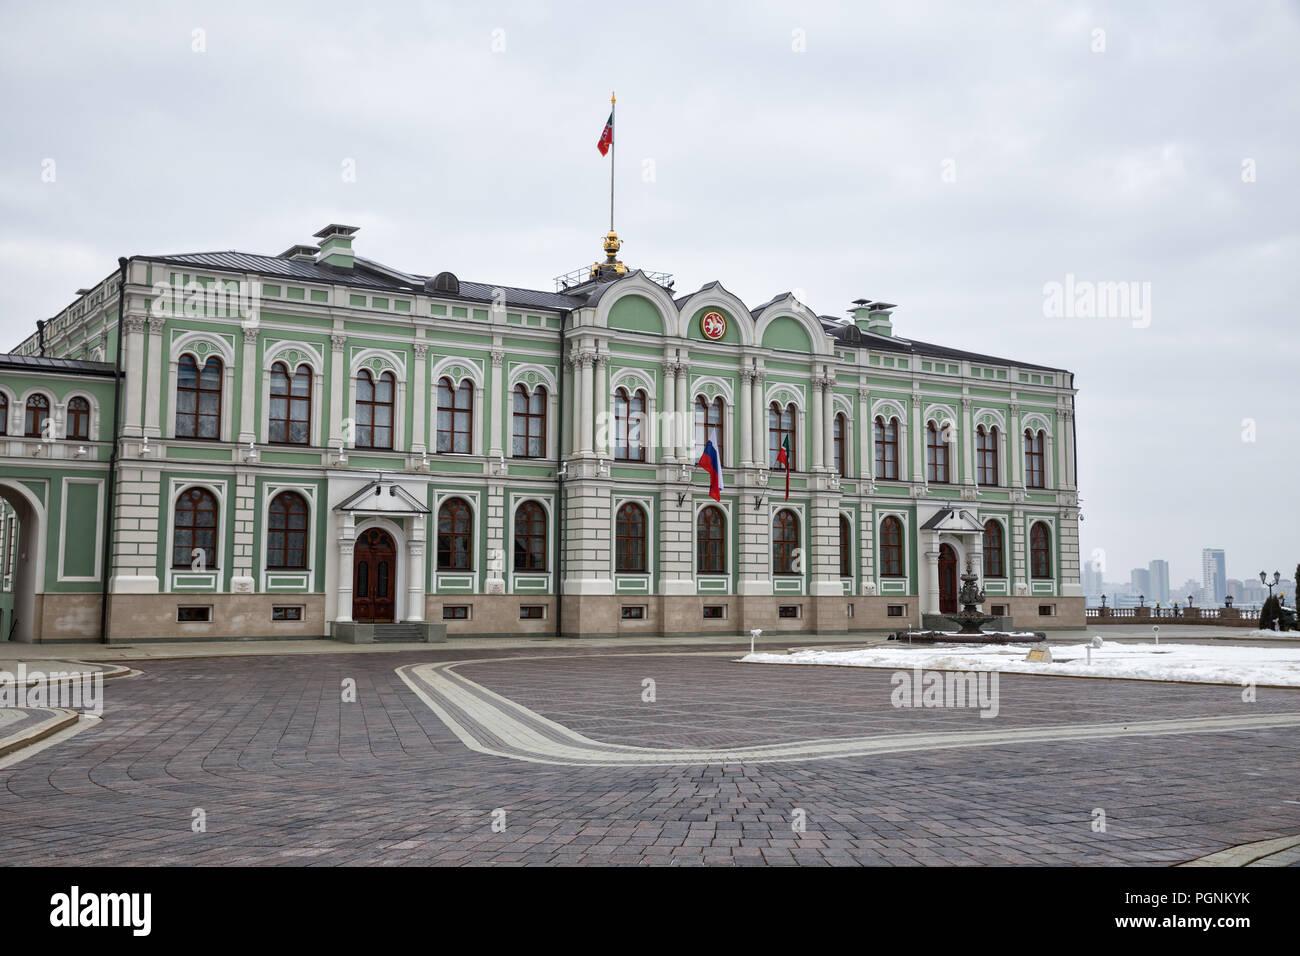 Presidential (former Governor's) Palace in the Kazan Kremlin, Republic of Tatarstan, Russia - Stock Image